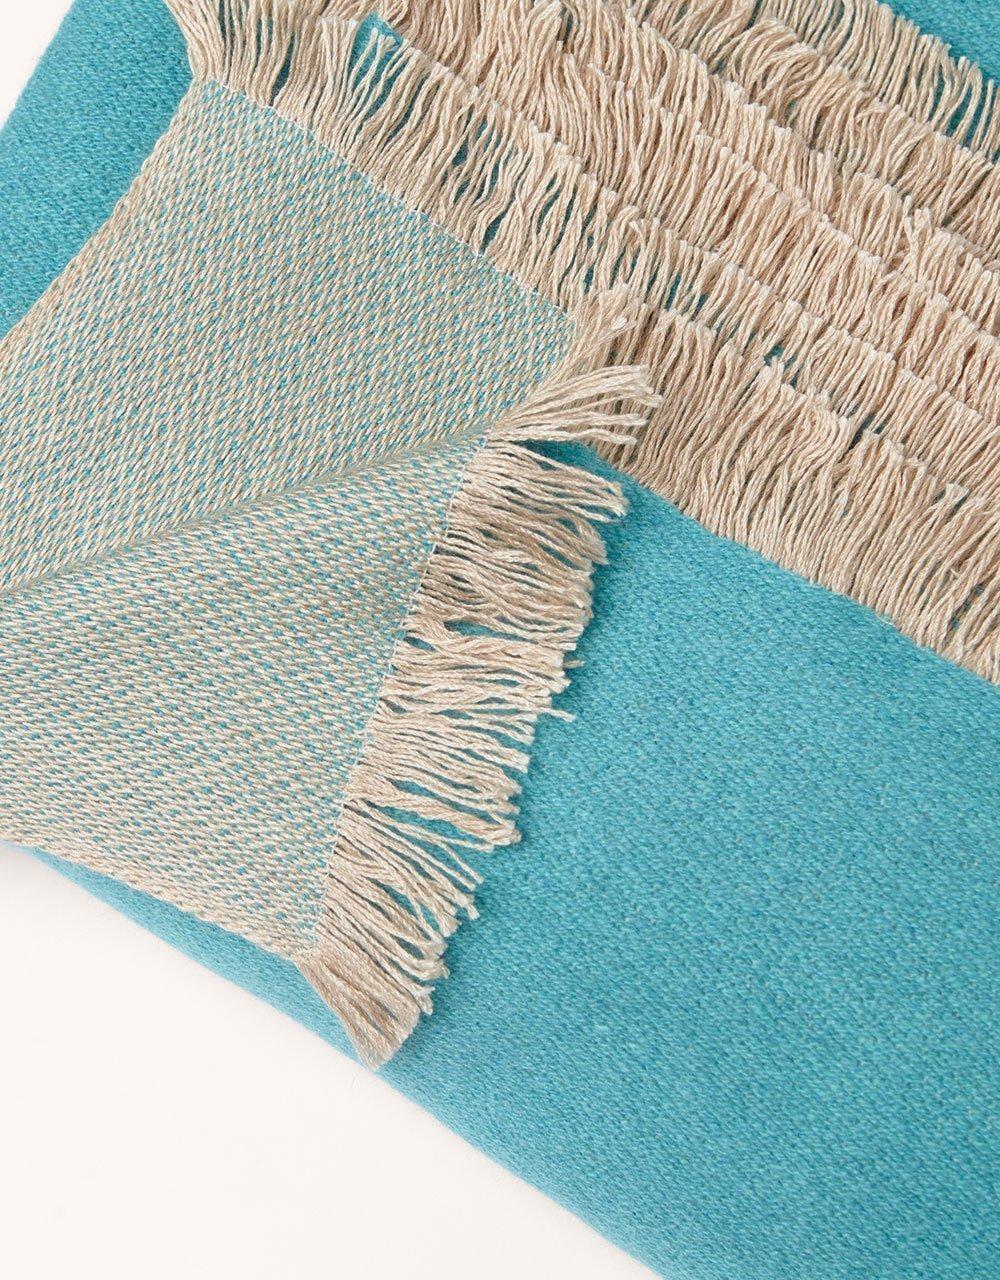 blanket01c